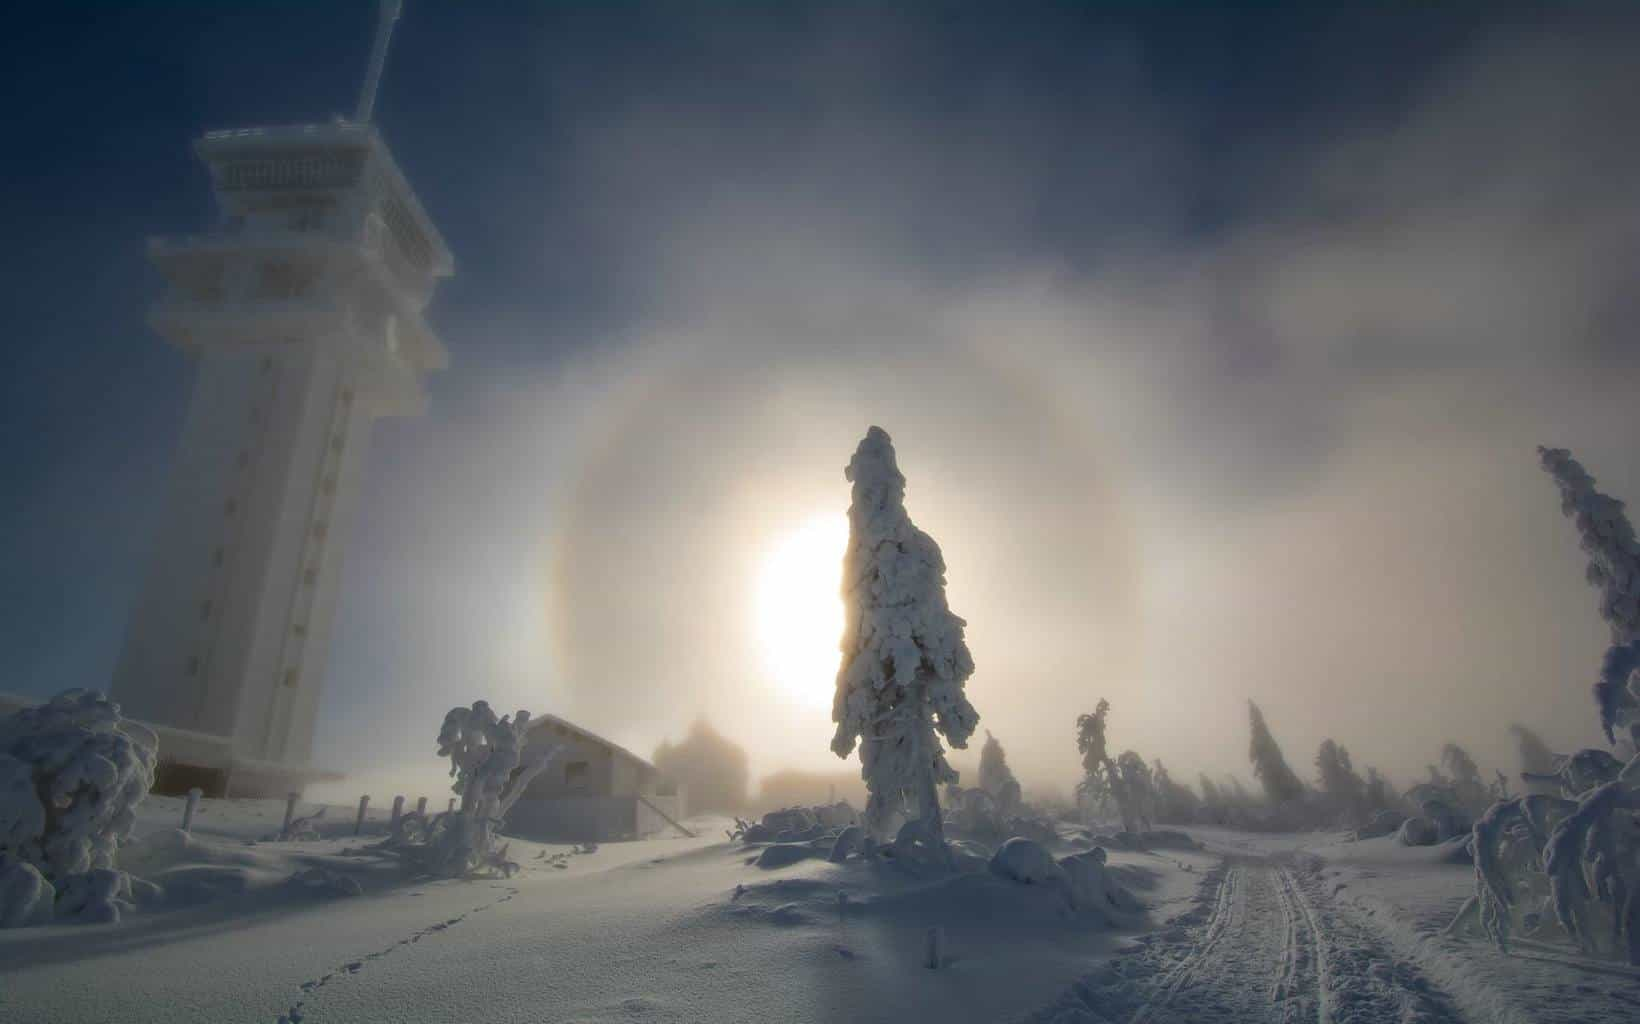 Diamond dust halo, -13 °C and snow, czech republic 19.1.2016